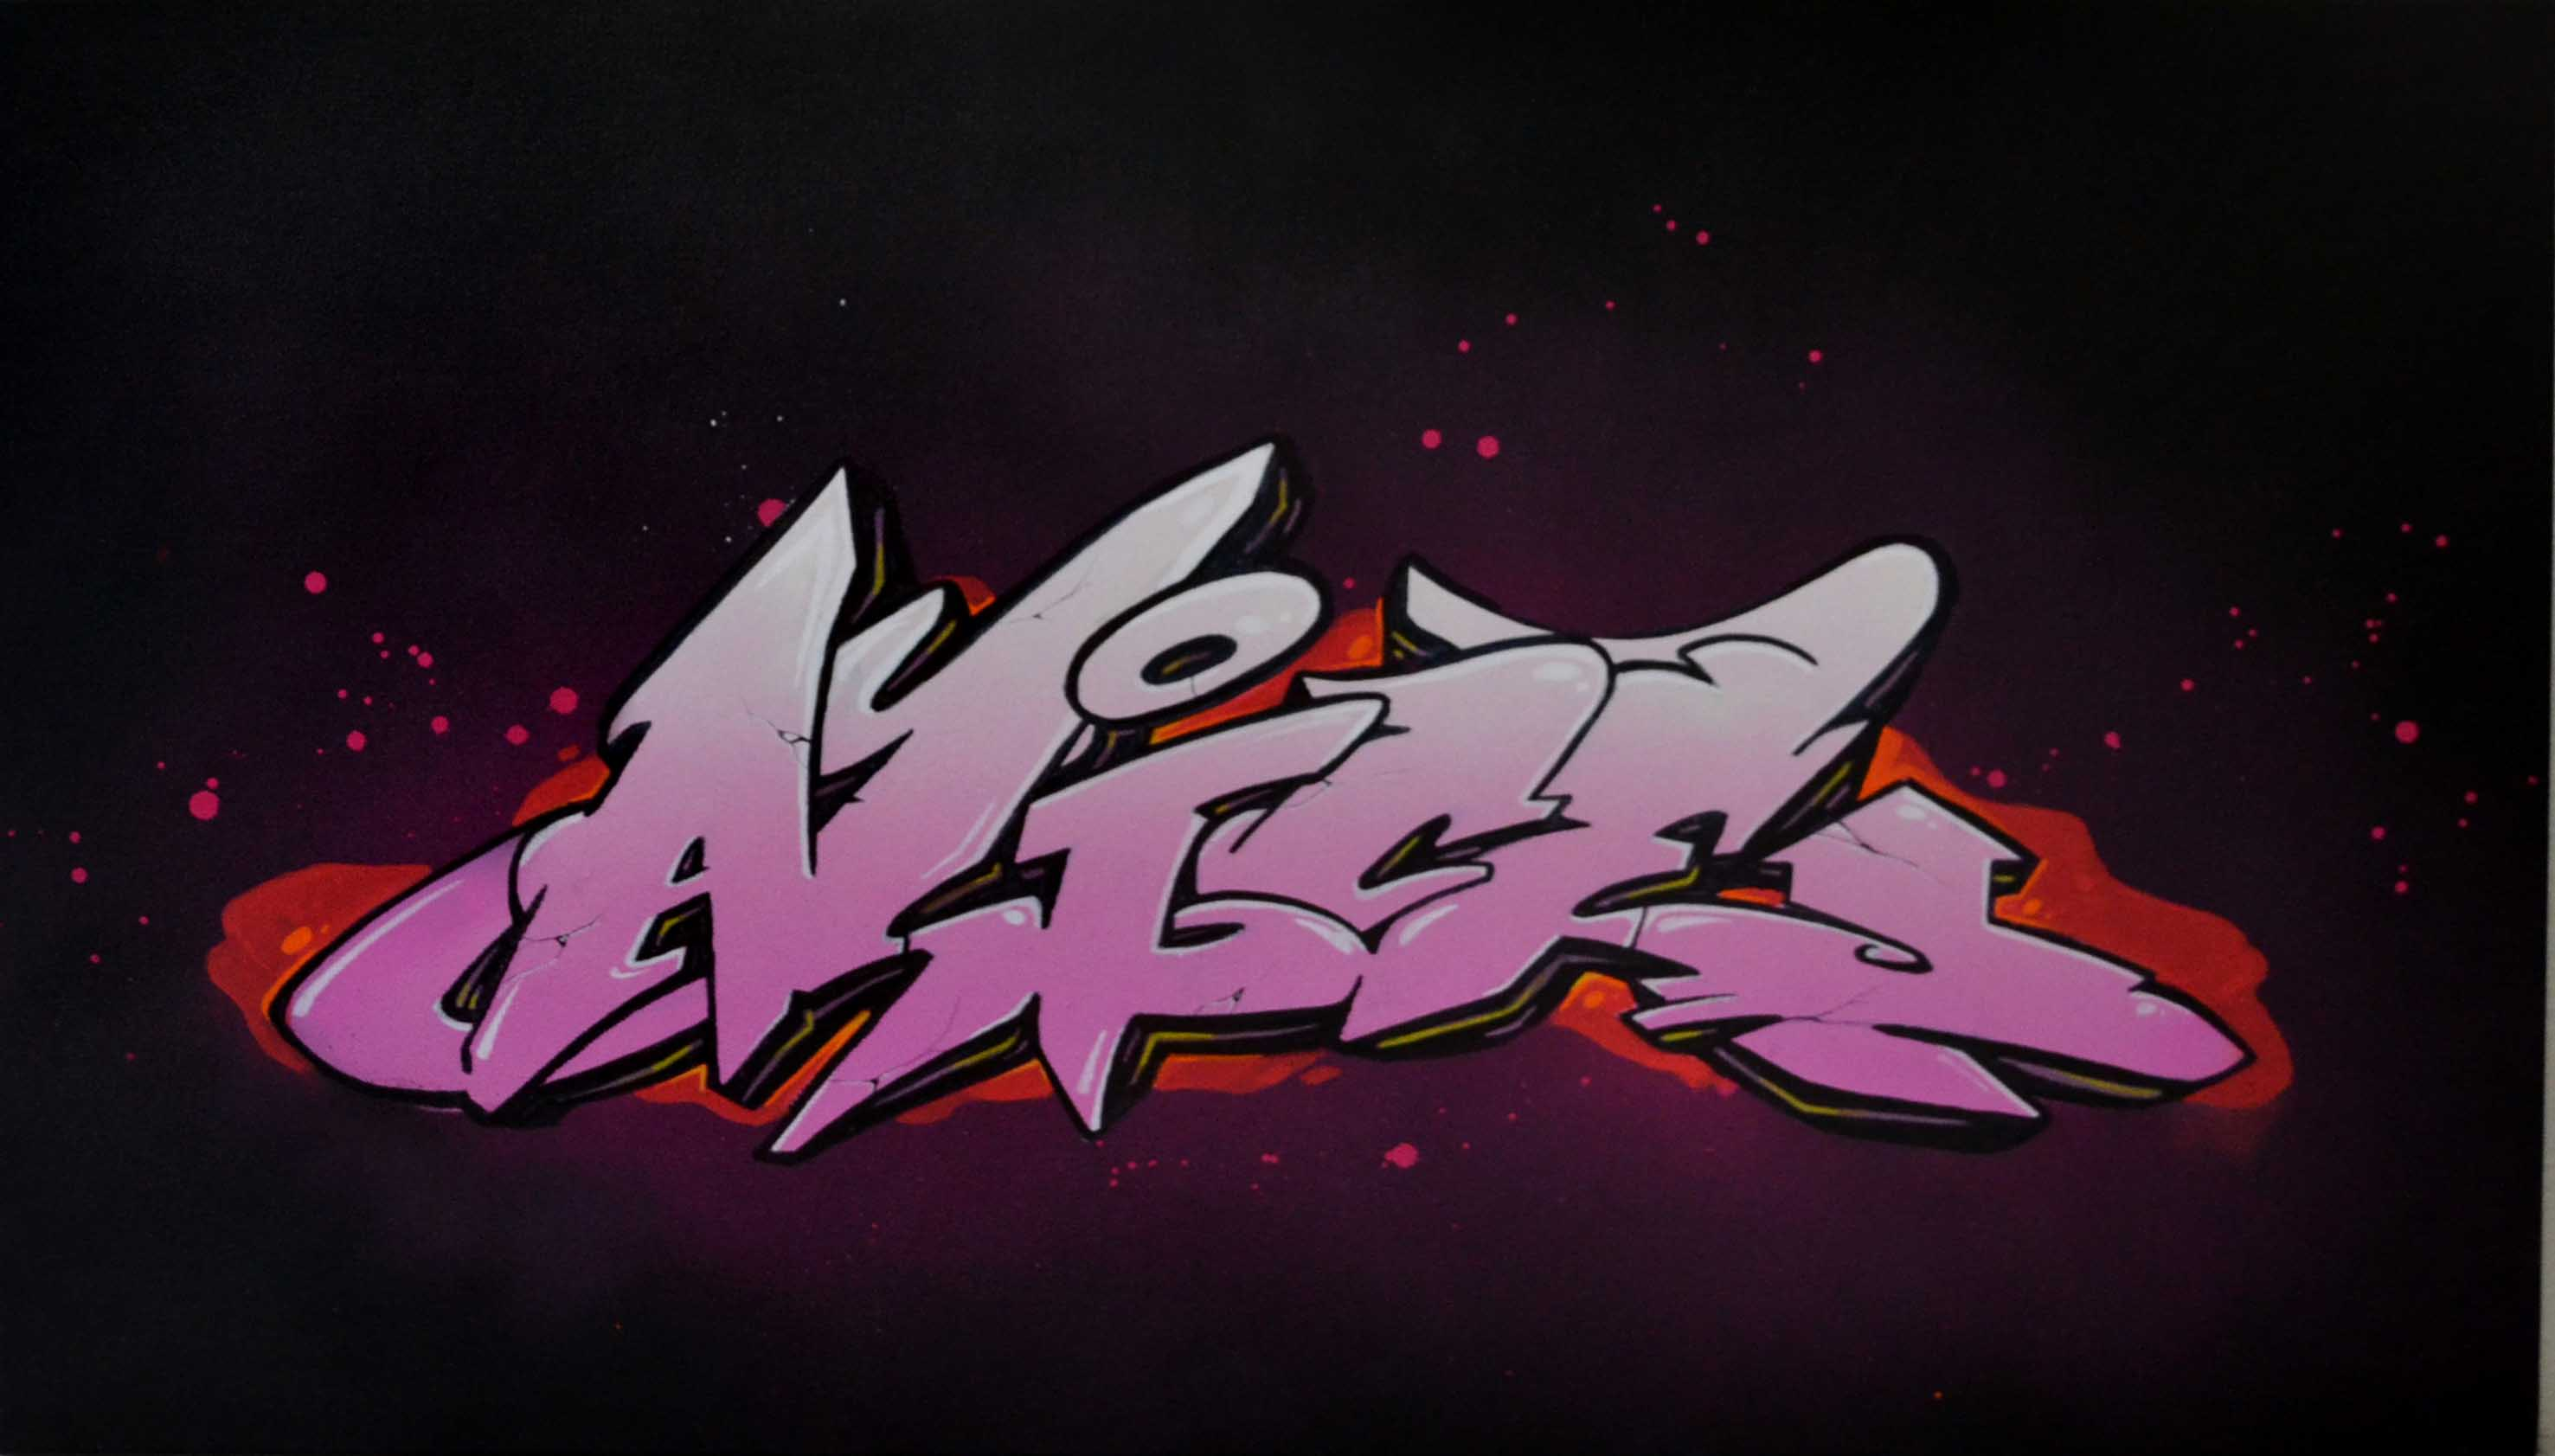 Graffiti Künstler Basel - Graffiti-Sprayer in der Schweiz